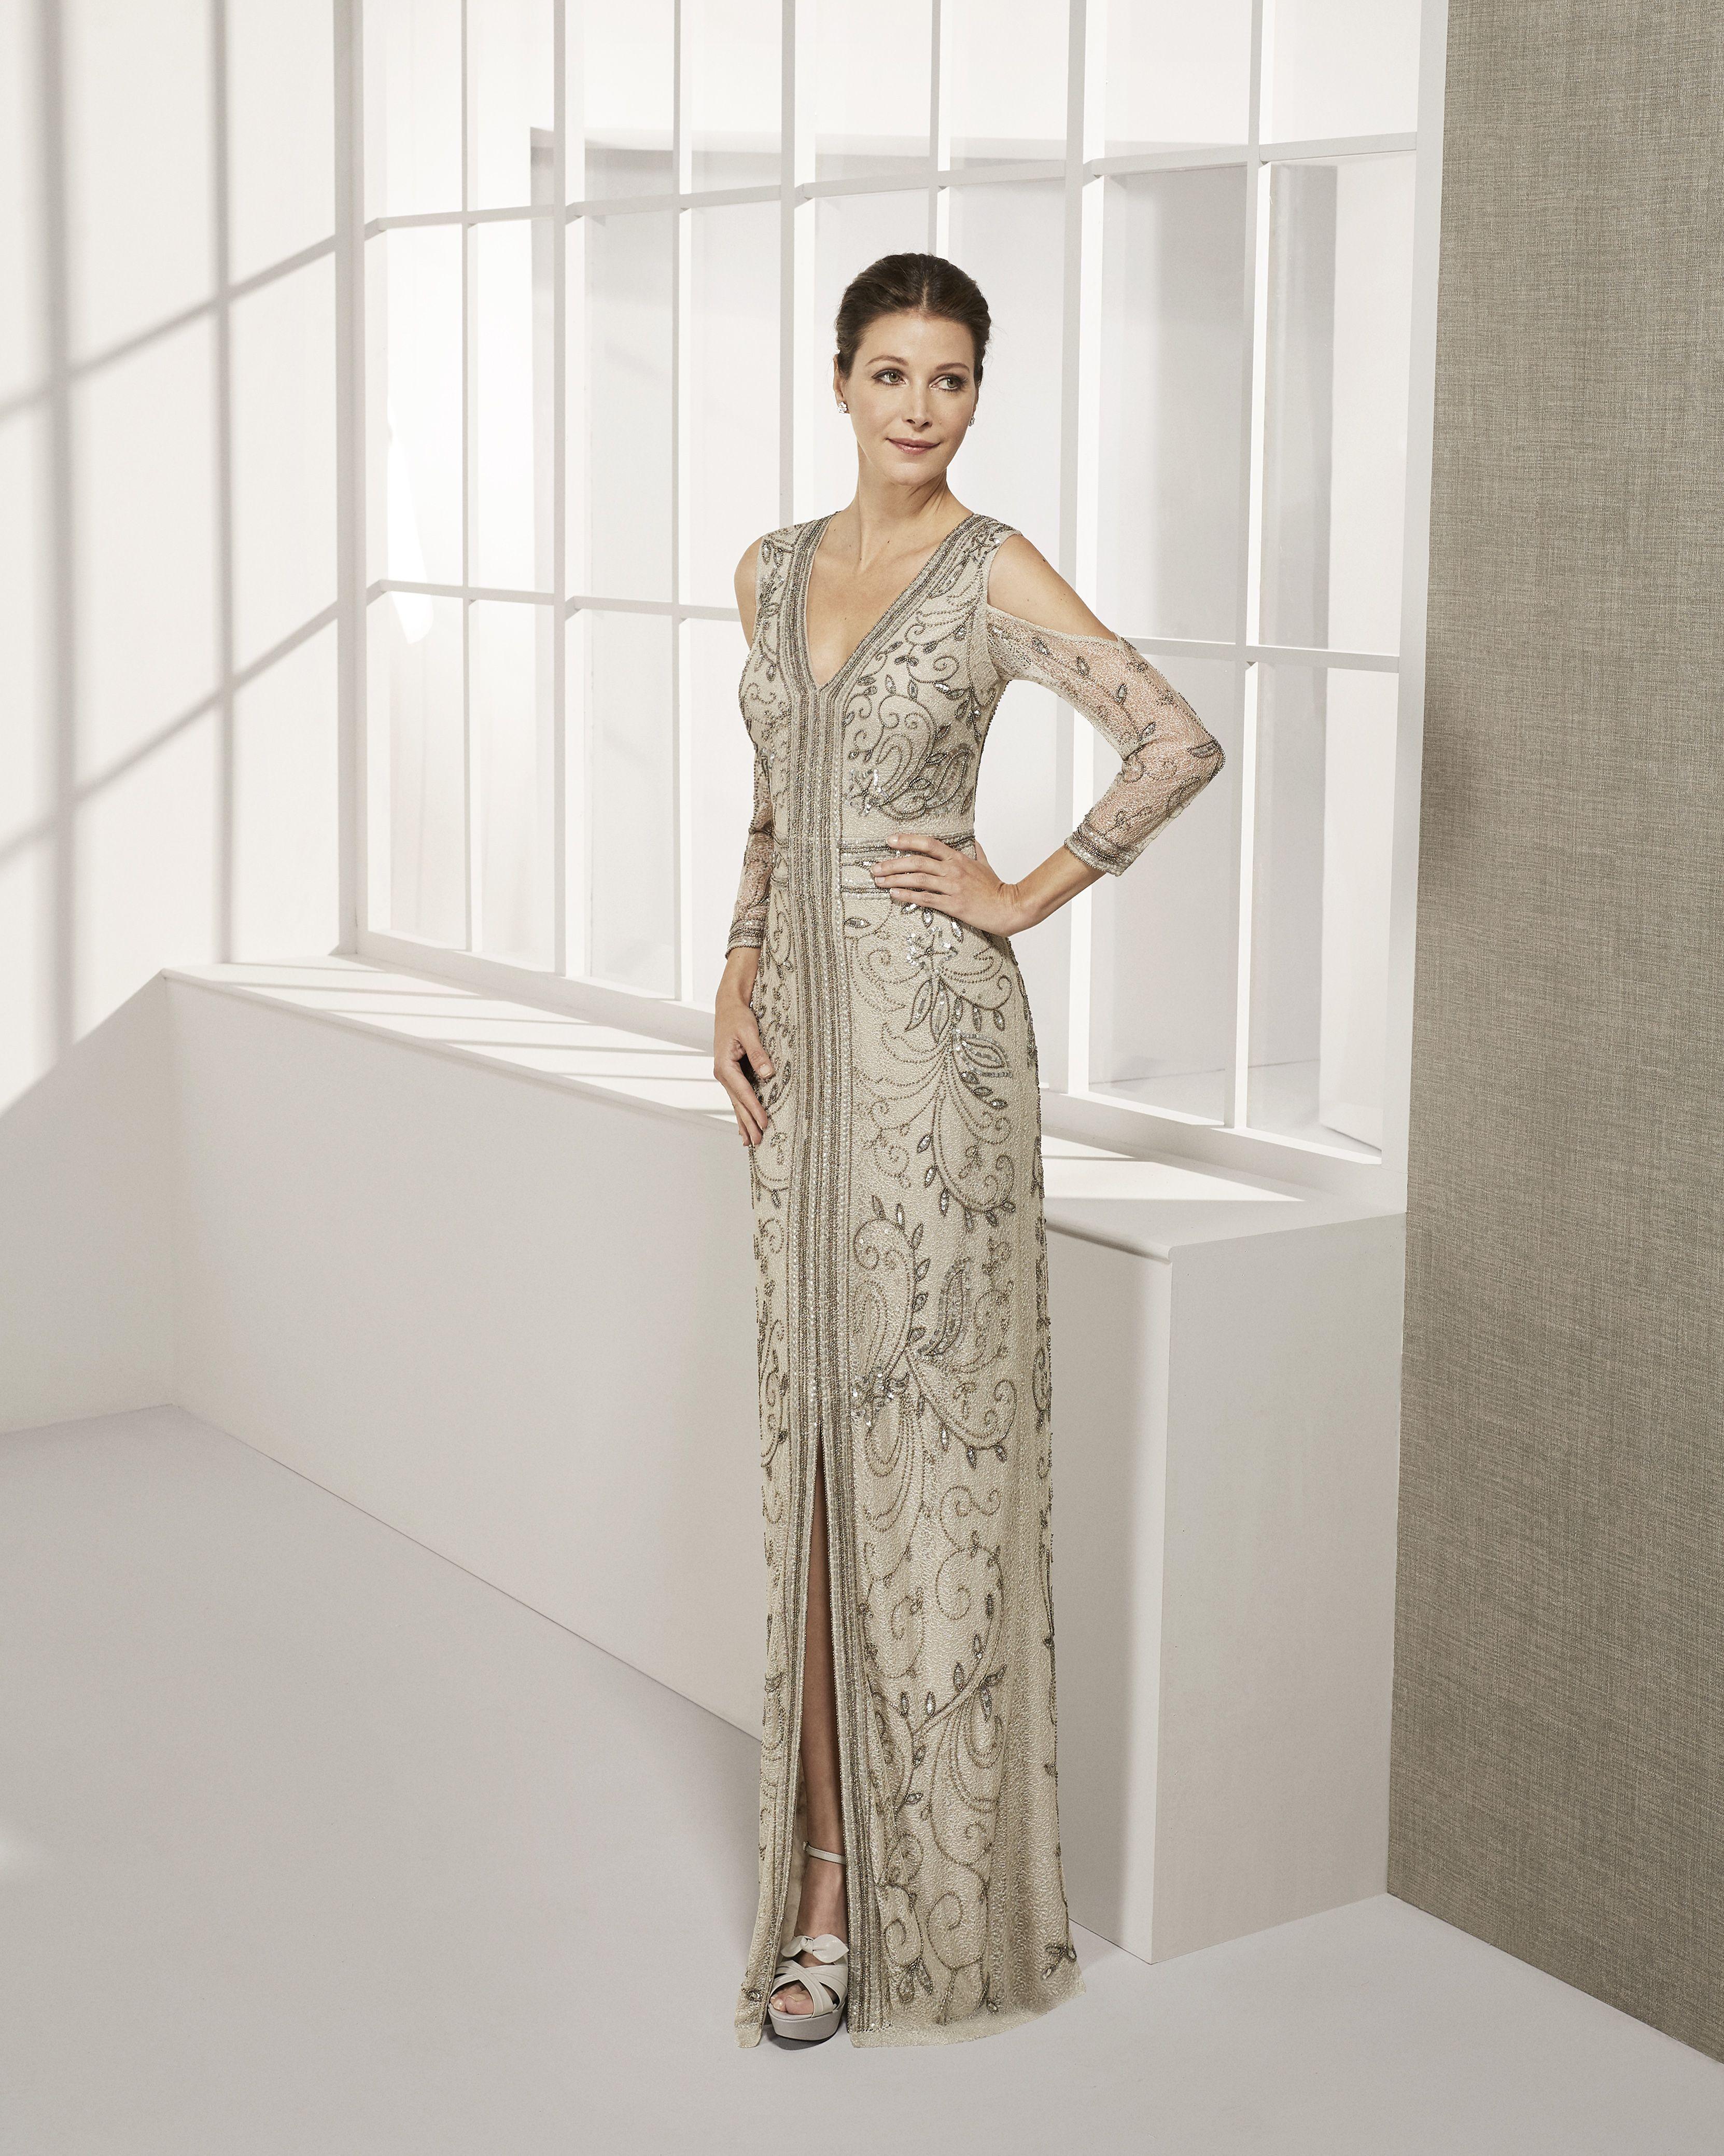 adb2f4bd1 Long beaded cocktail dress. With V-neckline and long sleeves. 2019 ROSA  CLARA COCKTAIL Collection — Vestido de fiesta largo en pedrería.